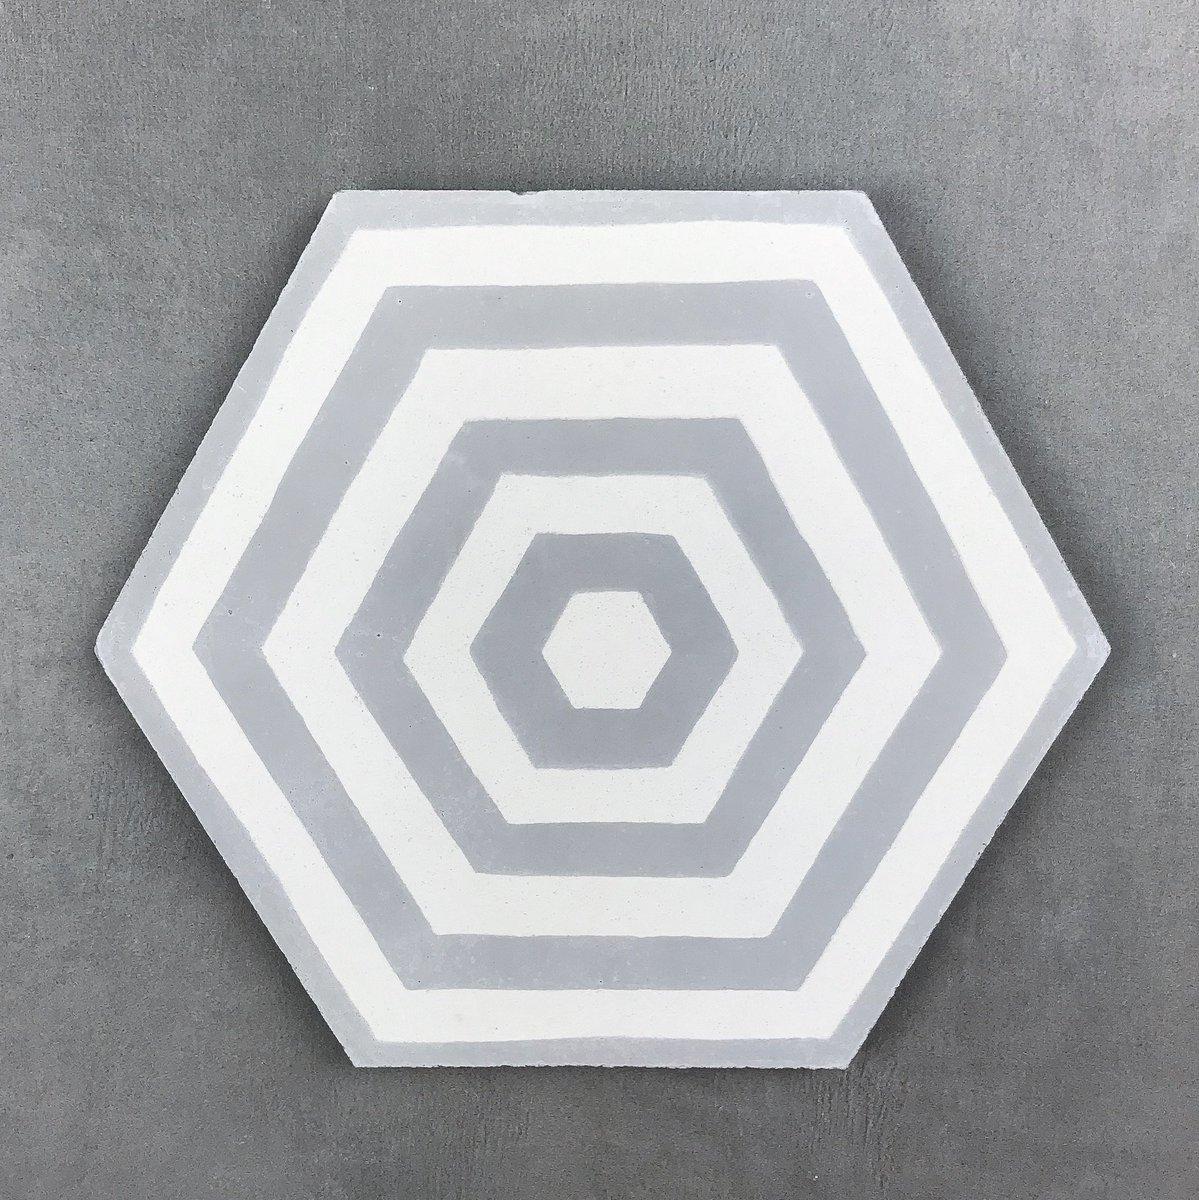 Terrazzo Tiles on Twitter: